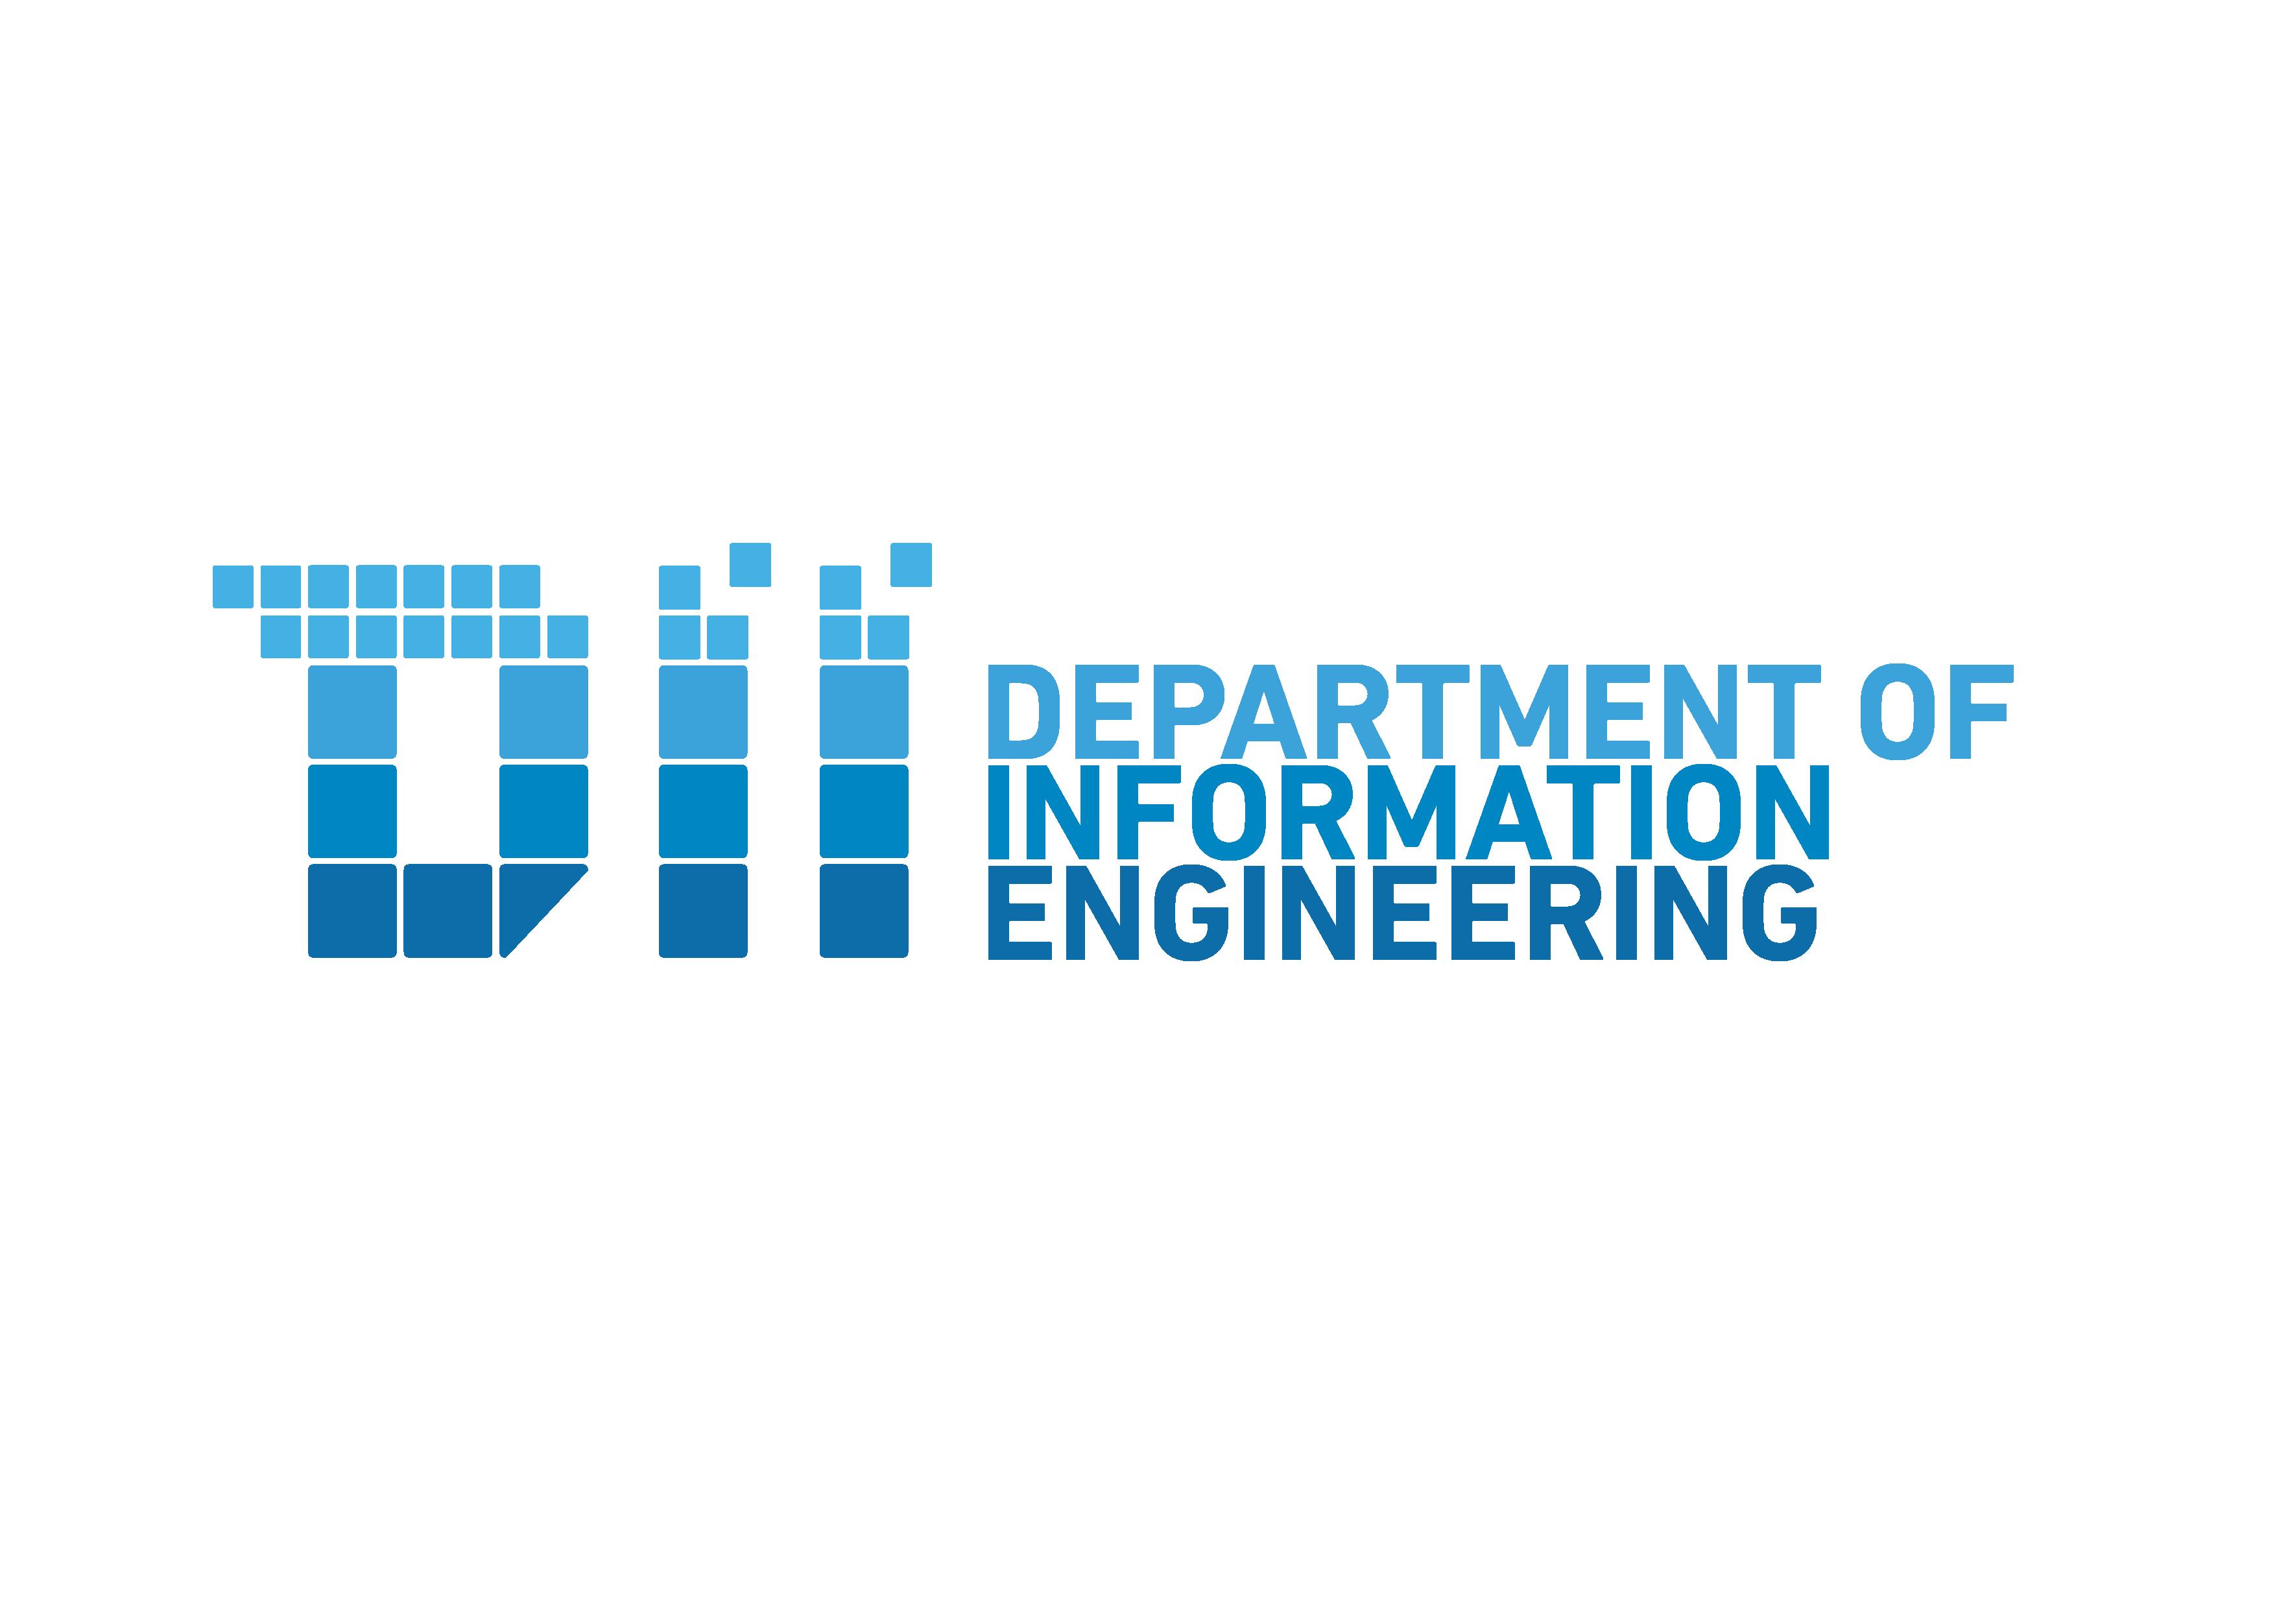 Department of Information Engineering